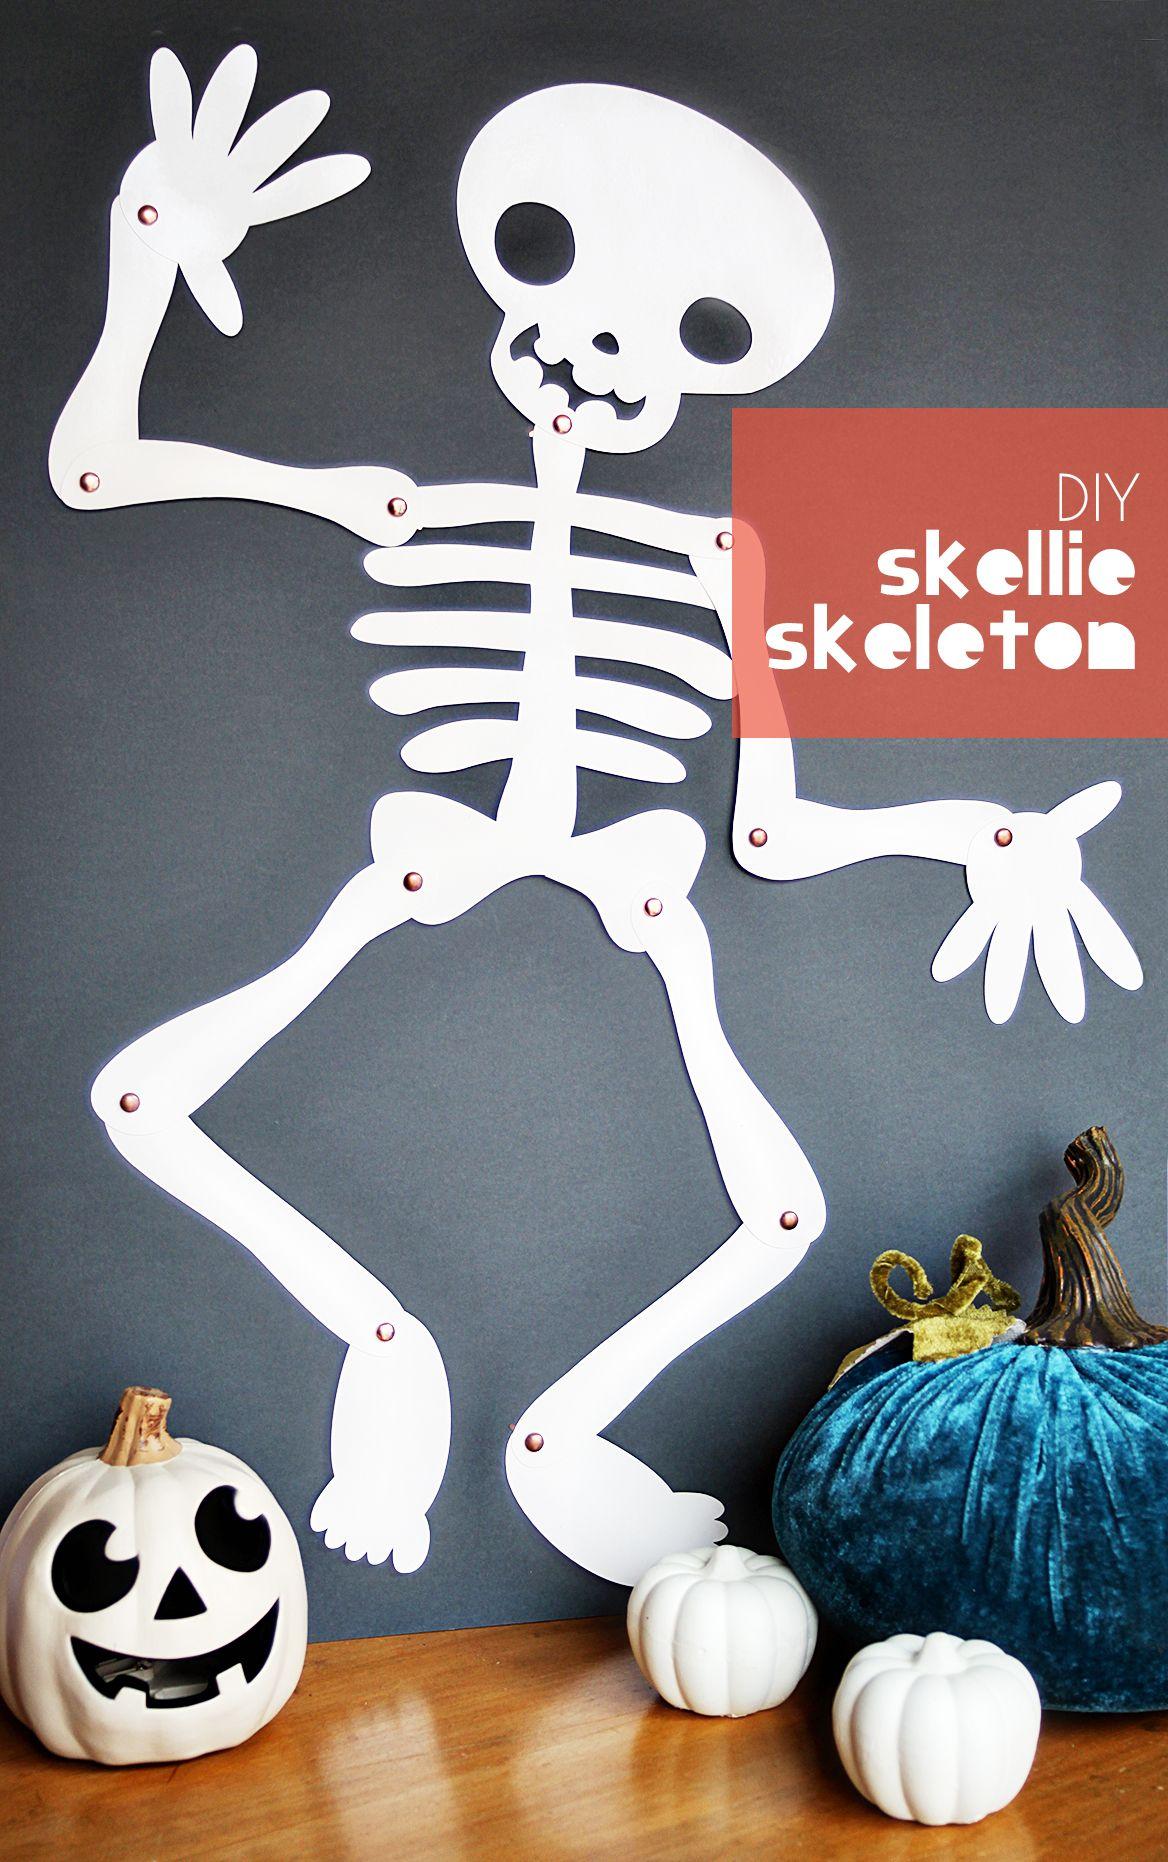 skellie skeleton DIY with cricut Halloween crafts